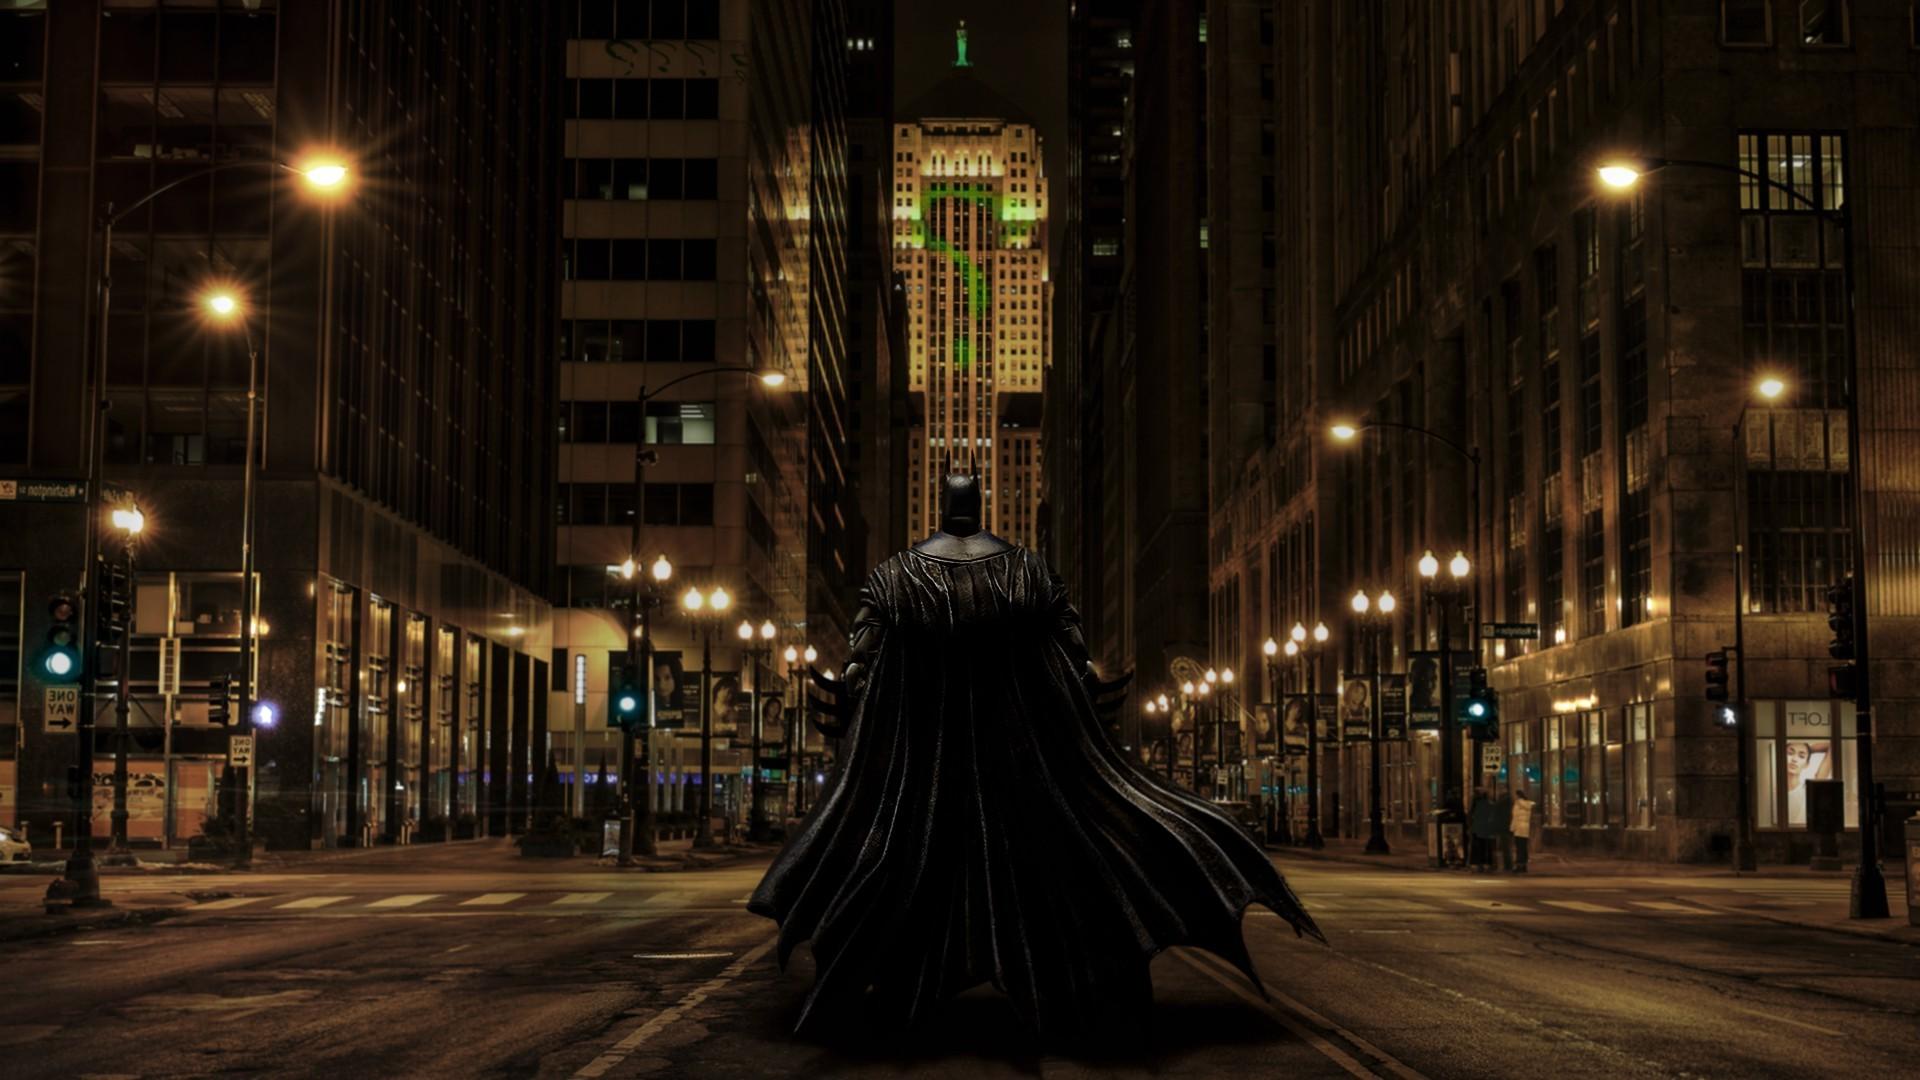 Wallpaper 1920x1080 Px Batman Chicago Fan Art Gotham City